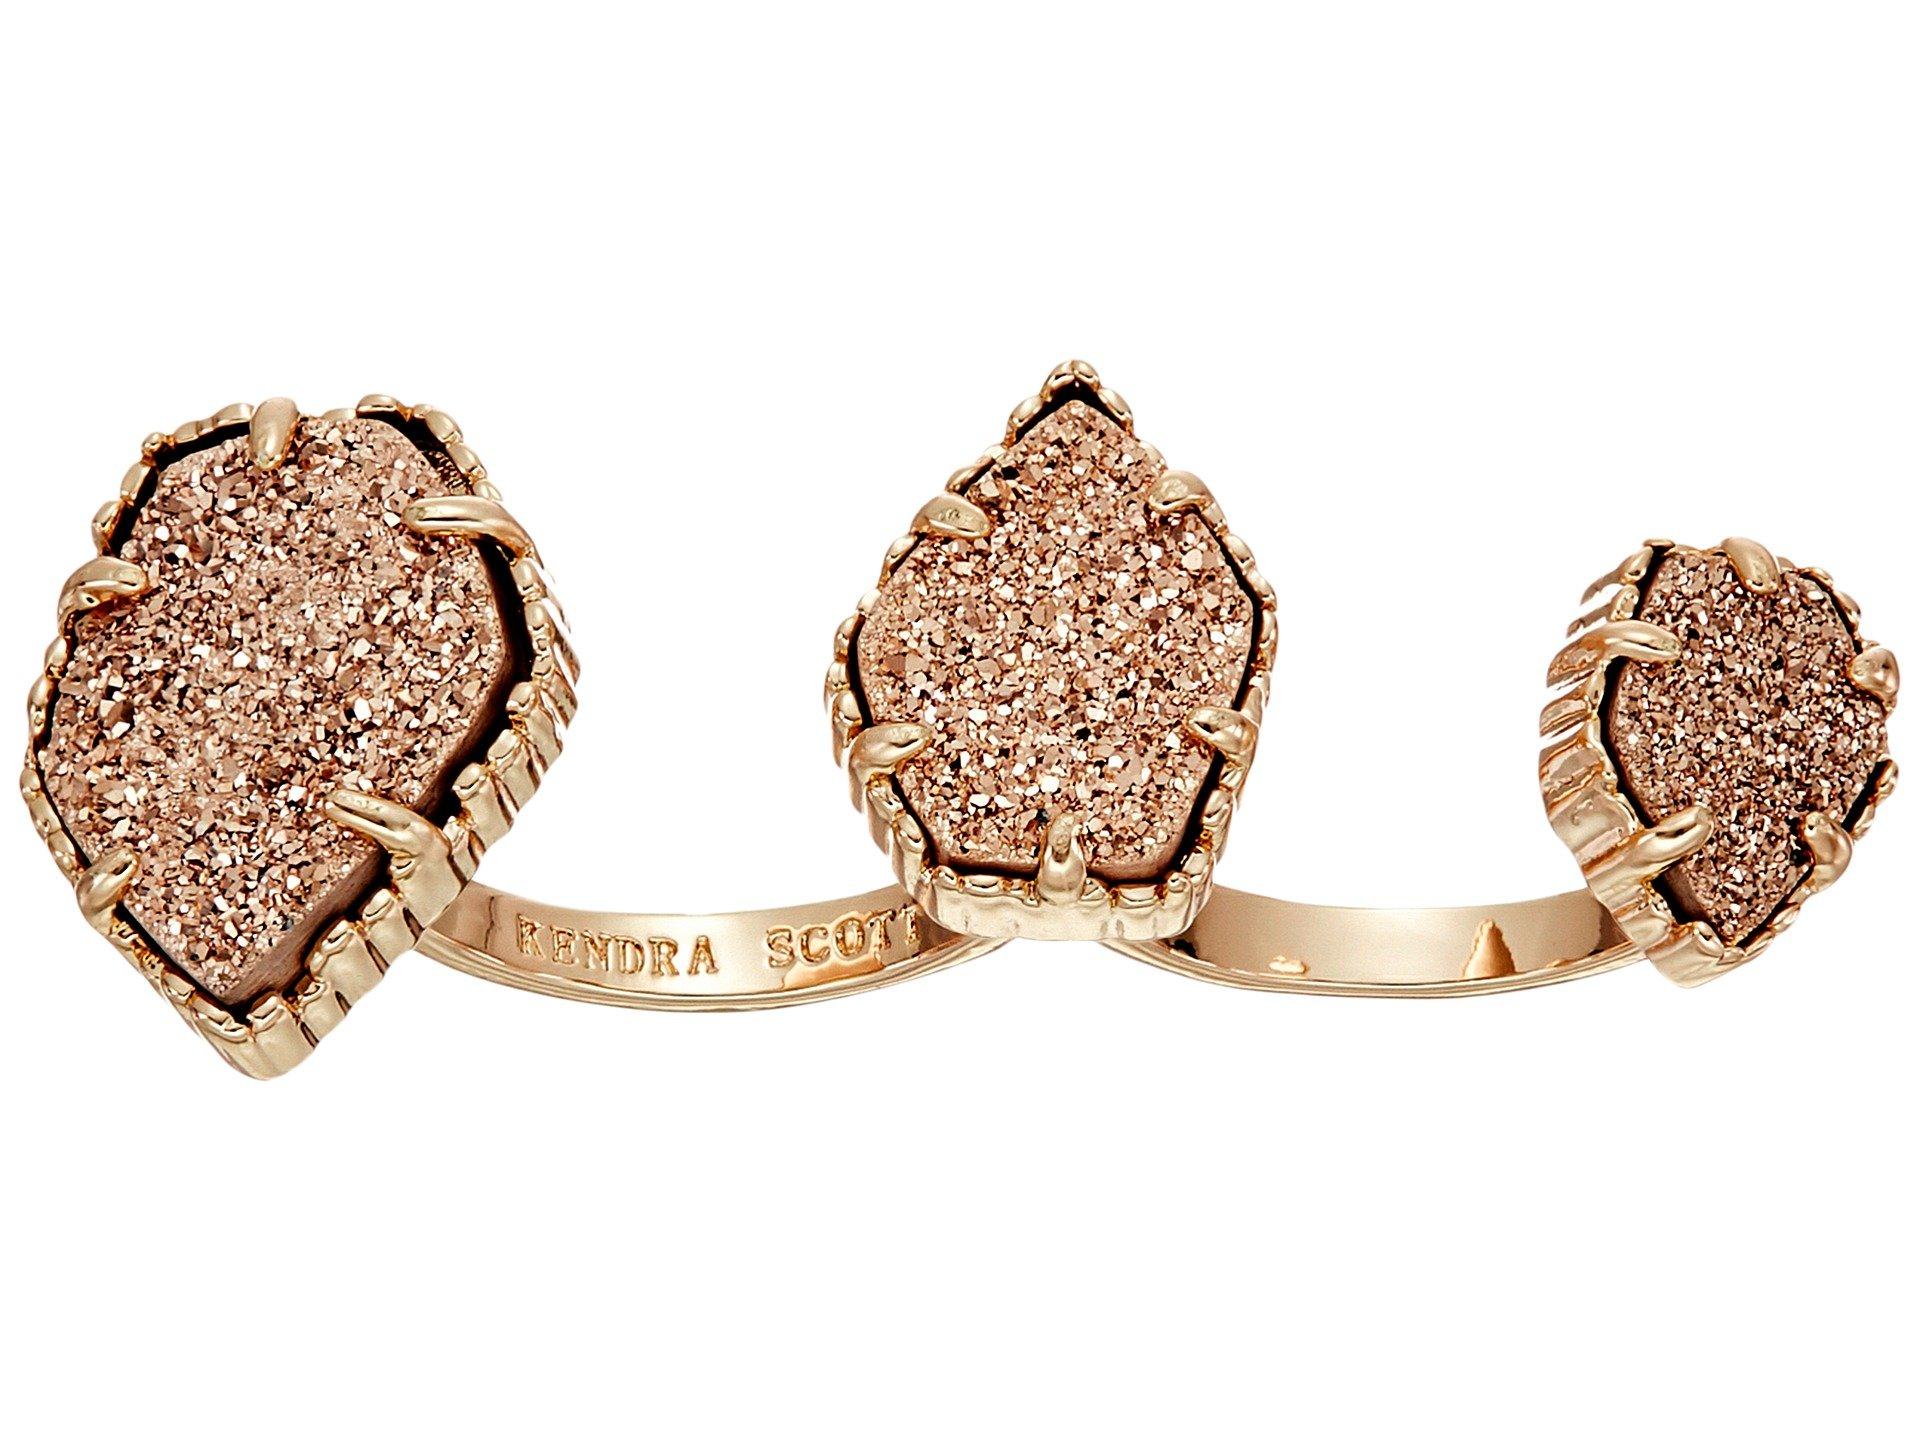 Kendra Scott Women's Naomi Two Finger Ring Adjustable Rose Gold/Rose Gold Drusy Ring